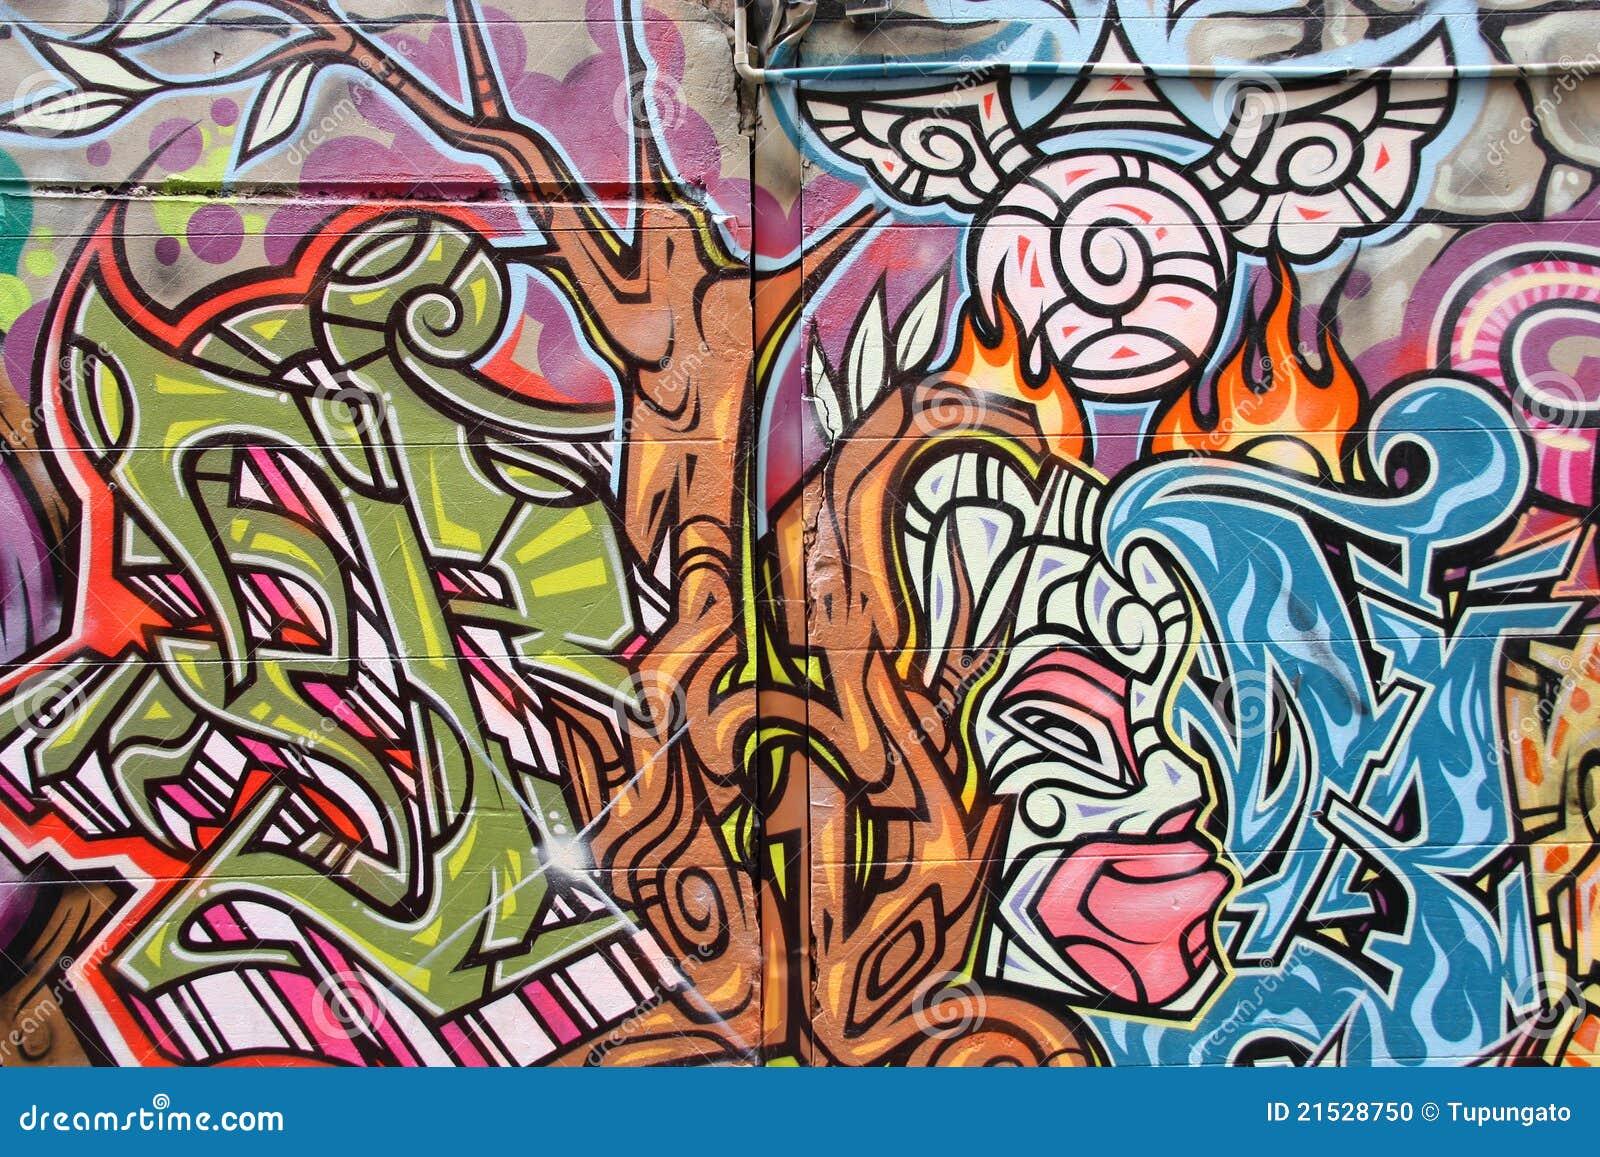 Art de graffiti en Australie